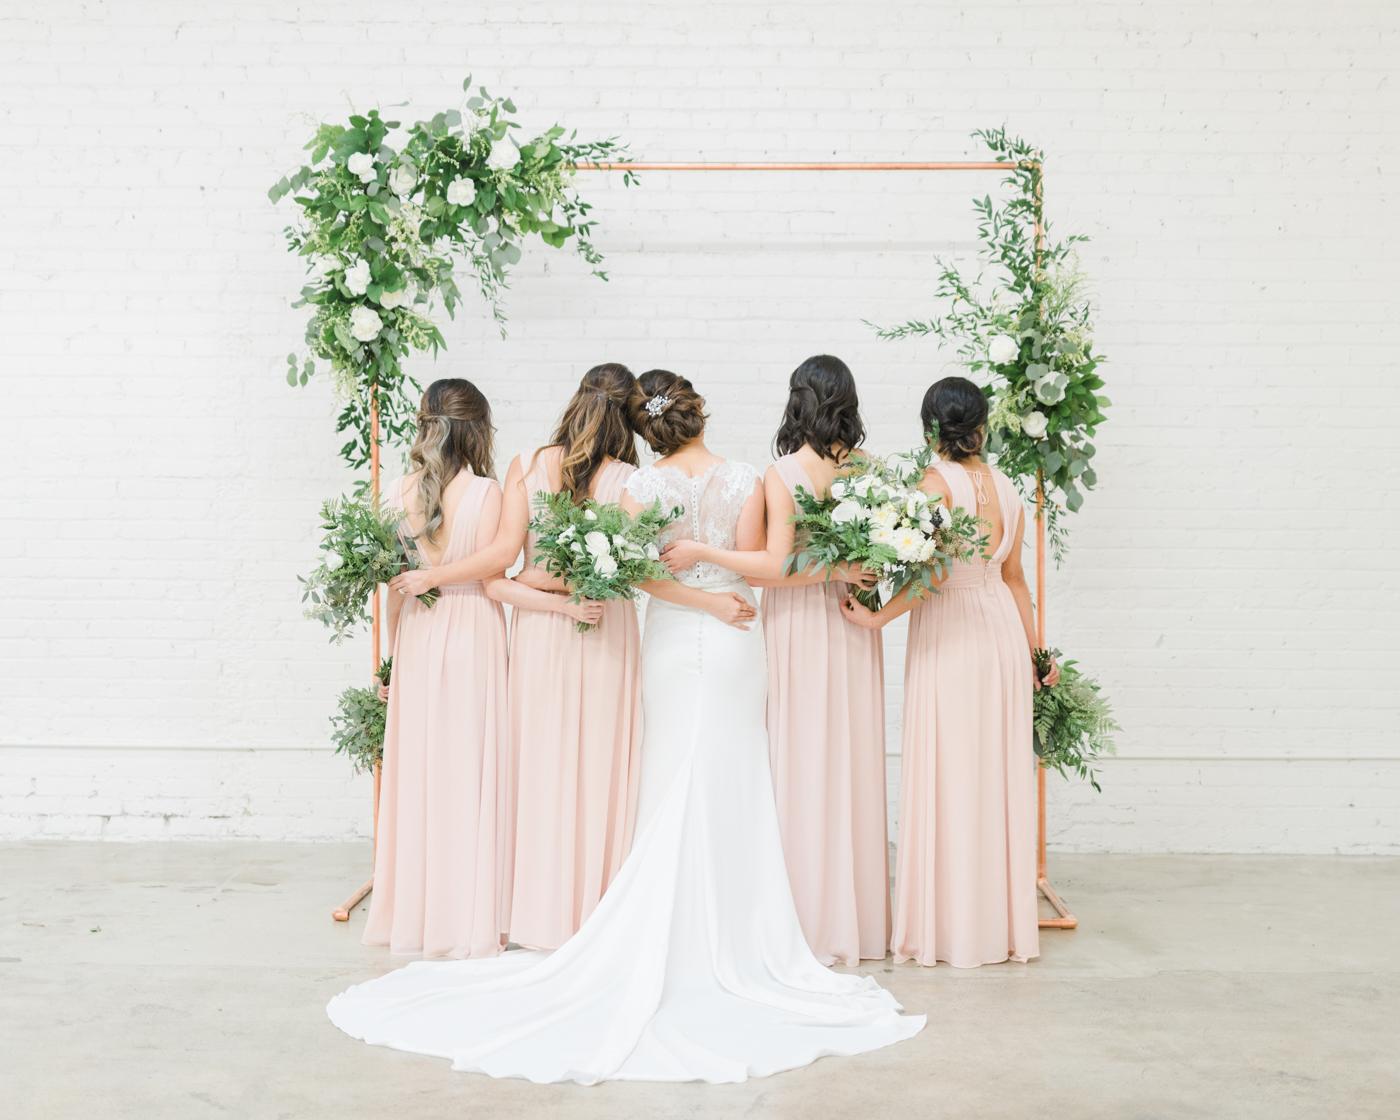 Modern_Wedding_HNYPT_Honeypot_LA_Photographer_Los_Angeles-19.jpg